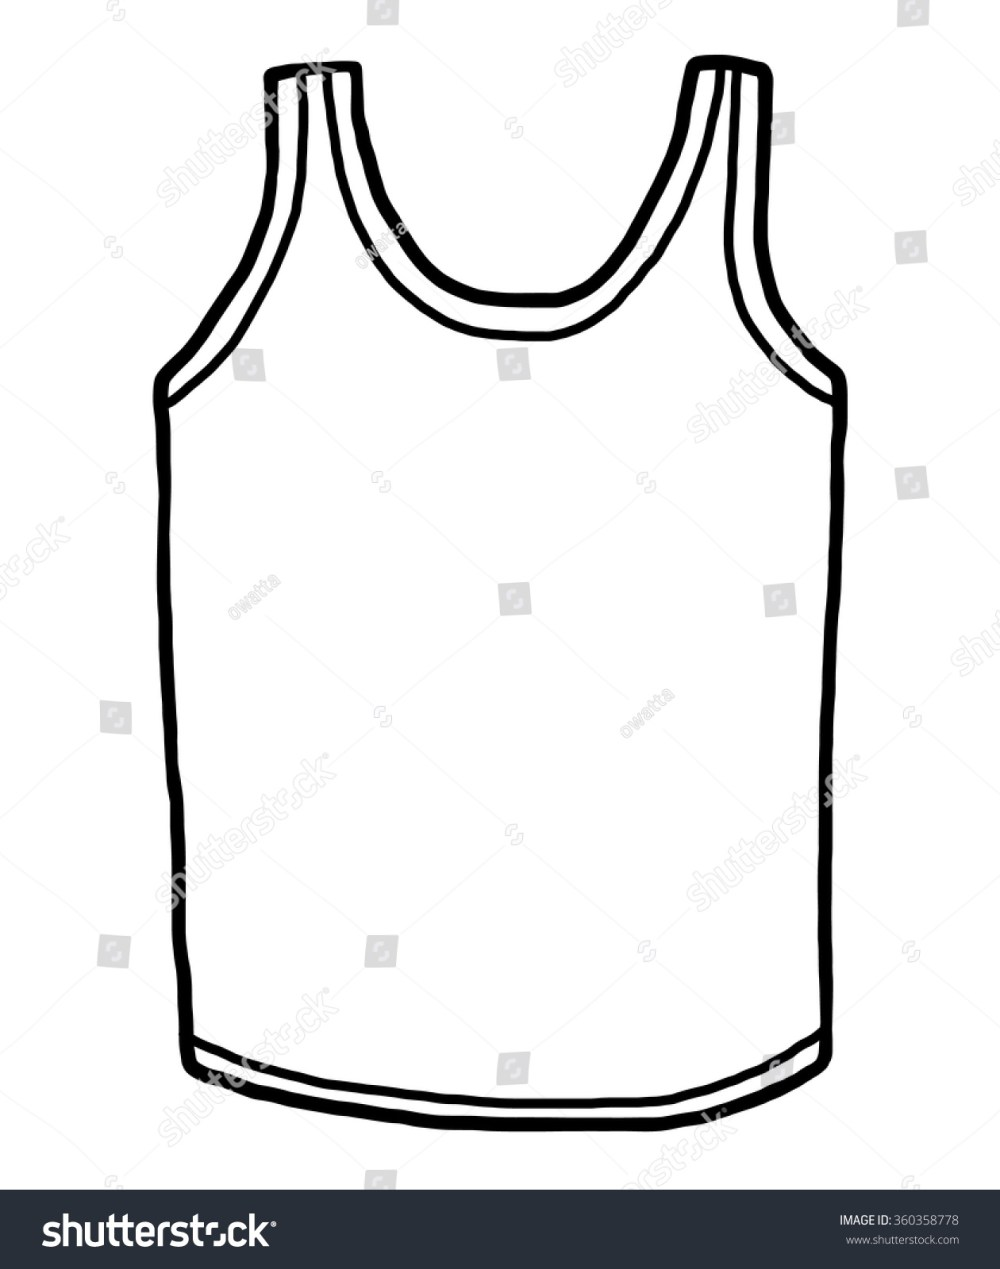 medium resolution of sport vest cartoon vector and illustration black and white hand drawn sketch